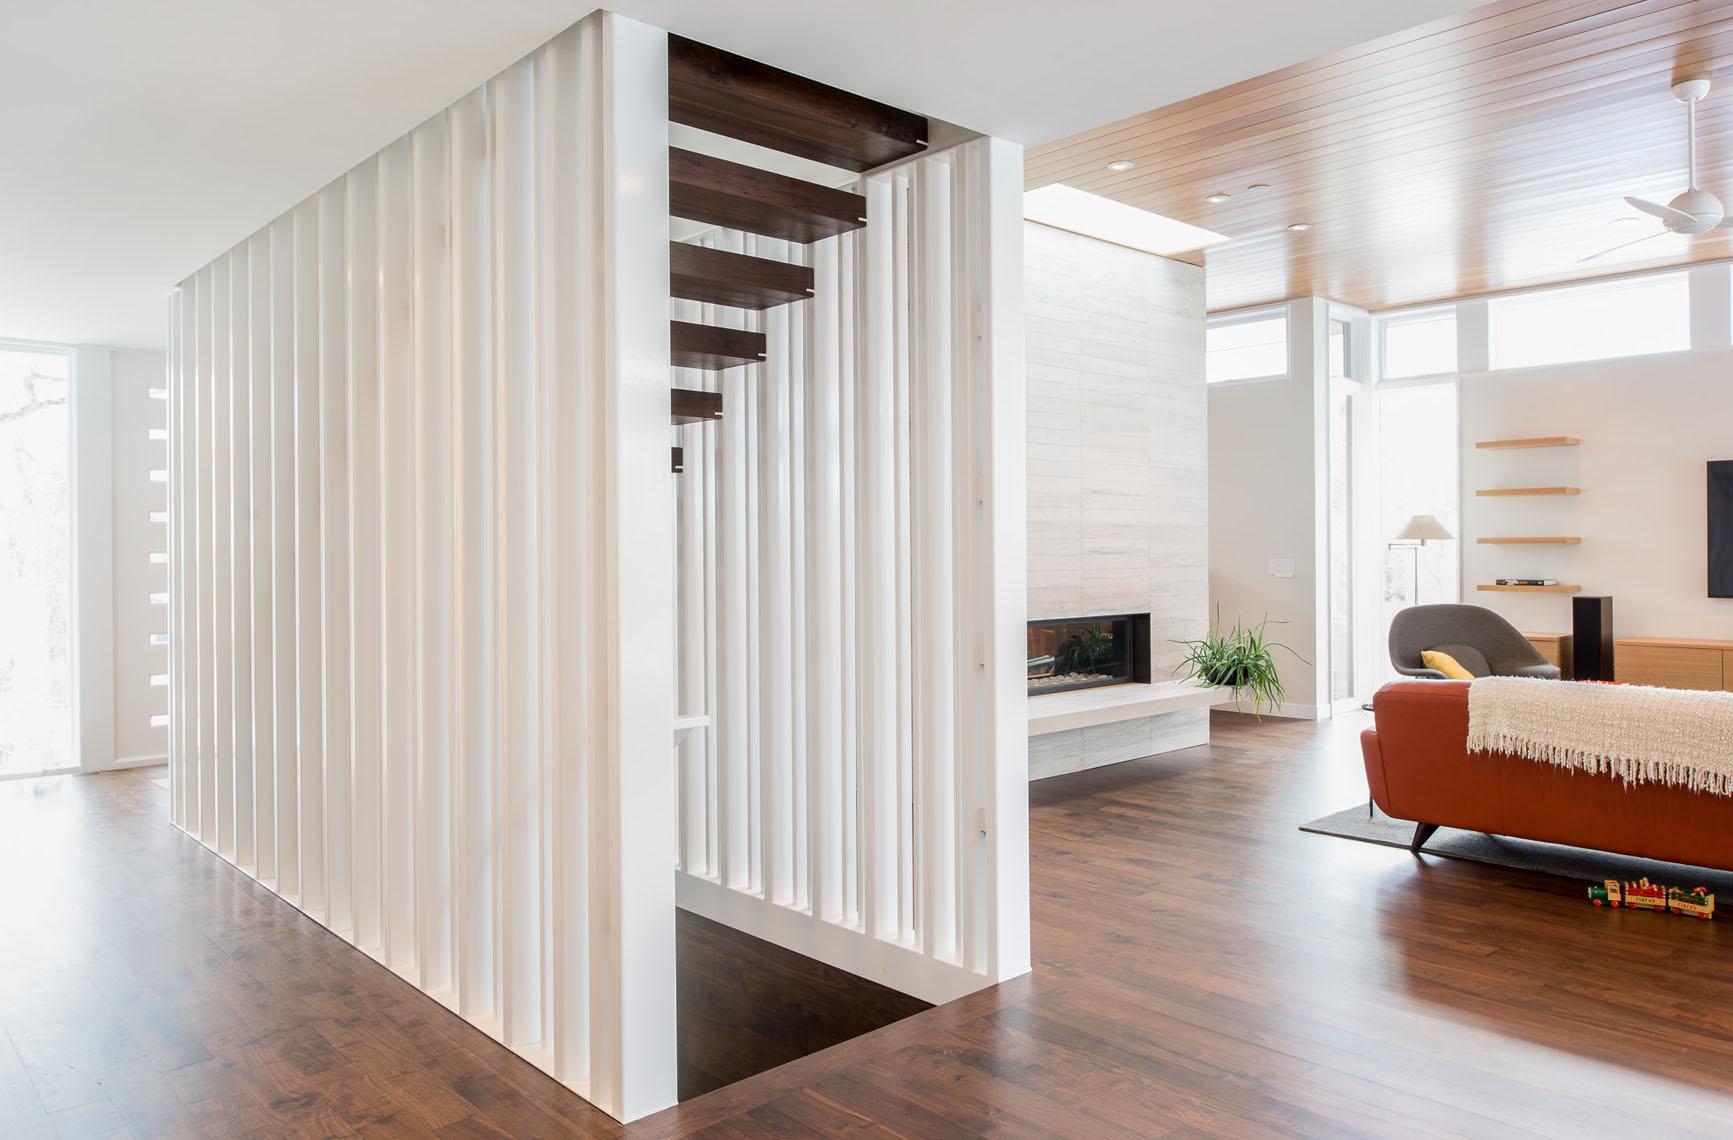 Custom floating tread stair with slat walls